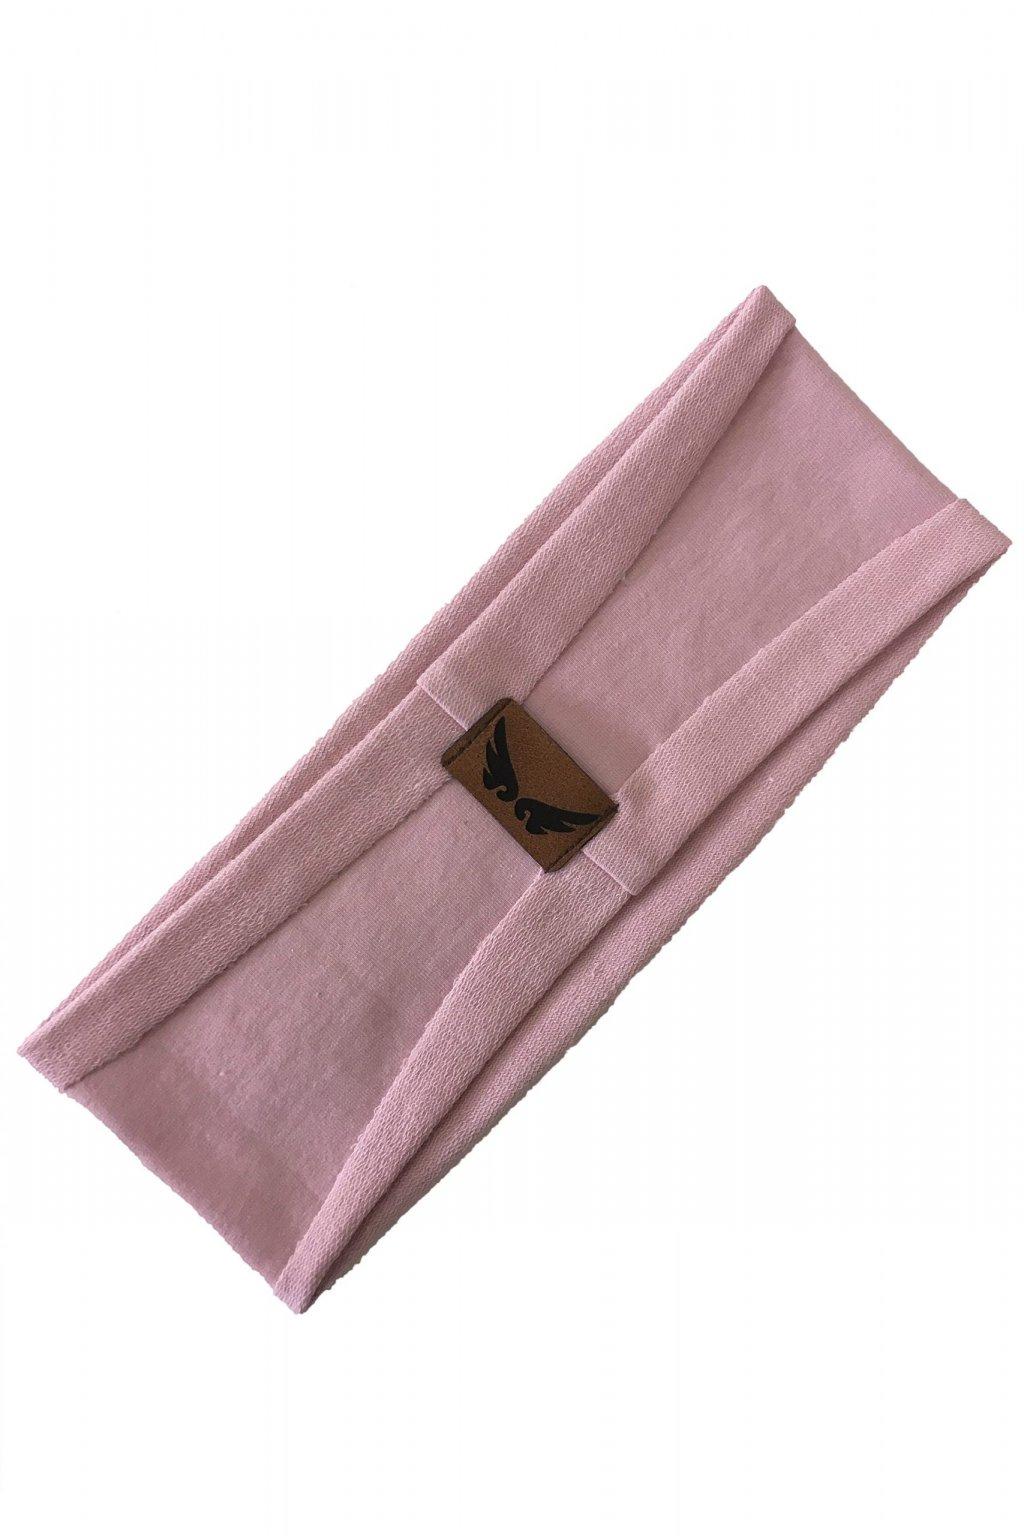 Čelenka Filii (puder)